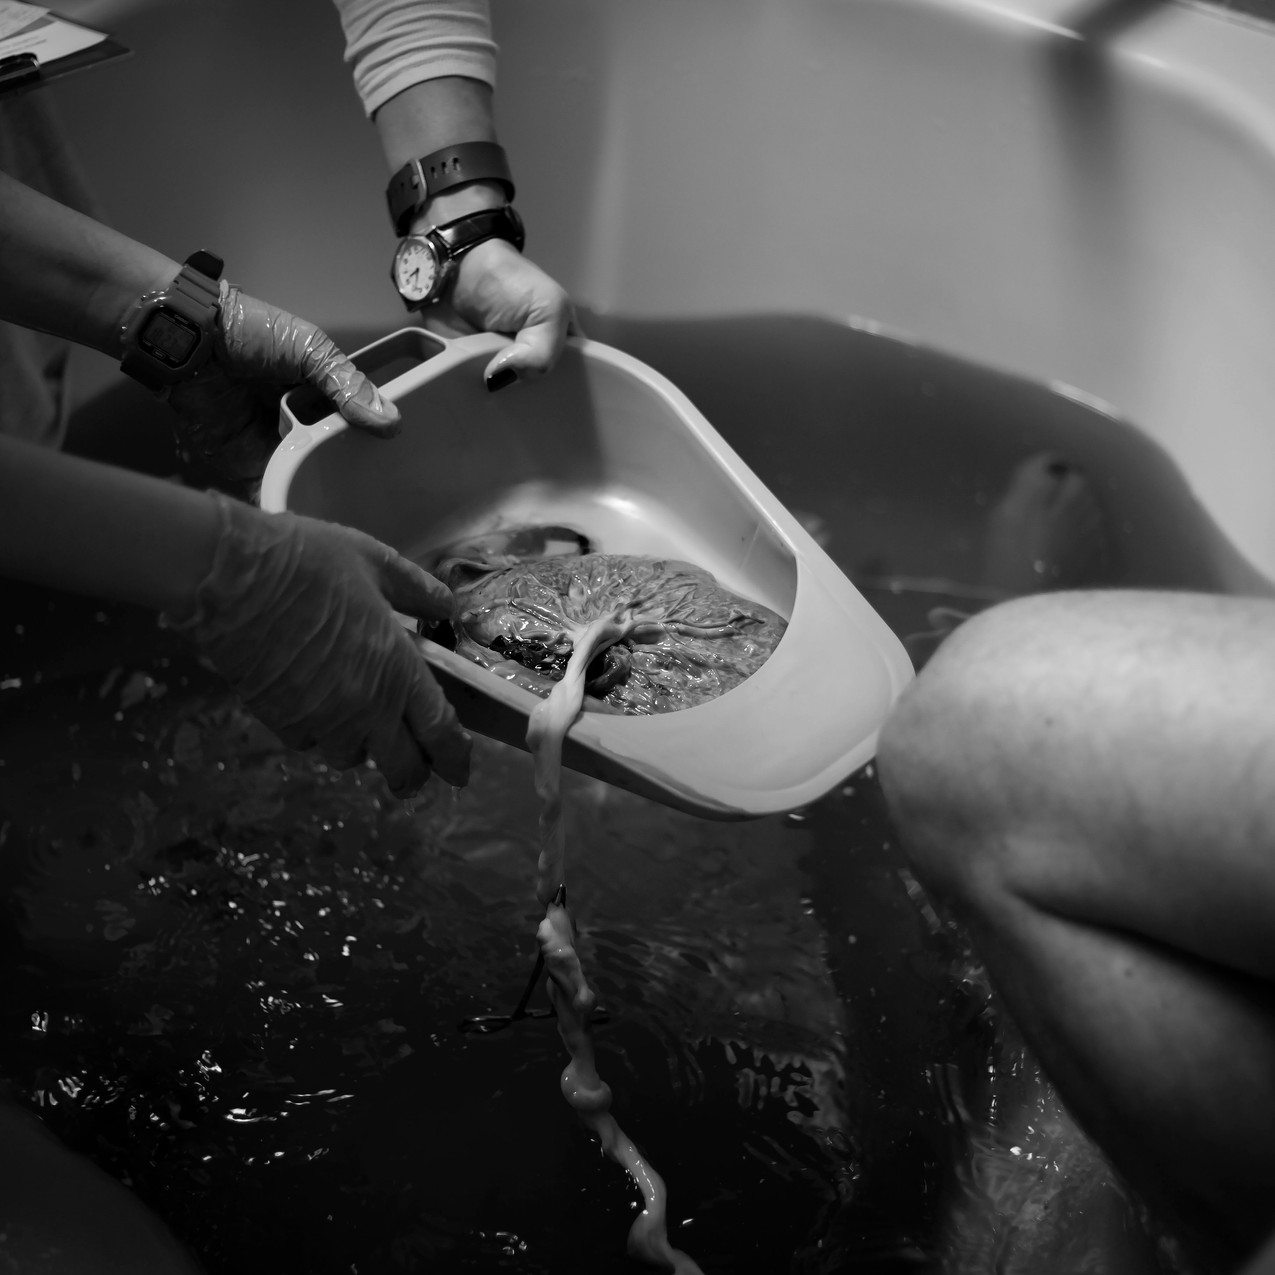 TampaBirthPhotographerLaborOfLoveBirthCenterLaborofLovebirthcenterTampaTampa Birth Photographer Tampa newborn Photographer in water birth Labor of love Lutz Fl_Jan252017_0198 copy